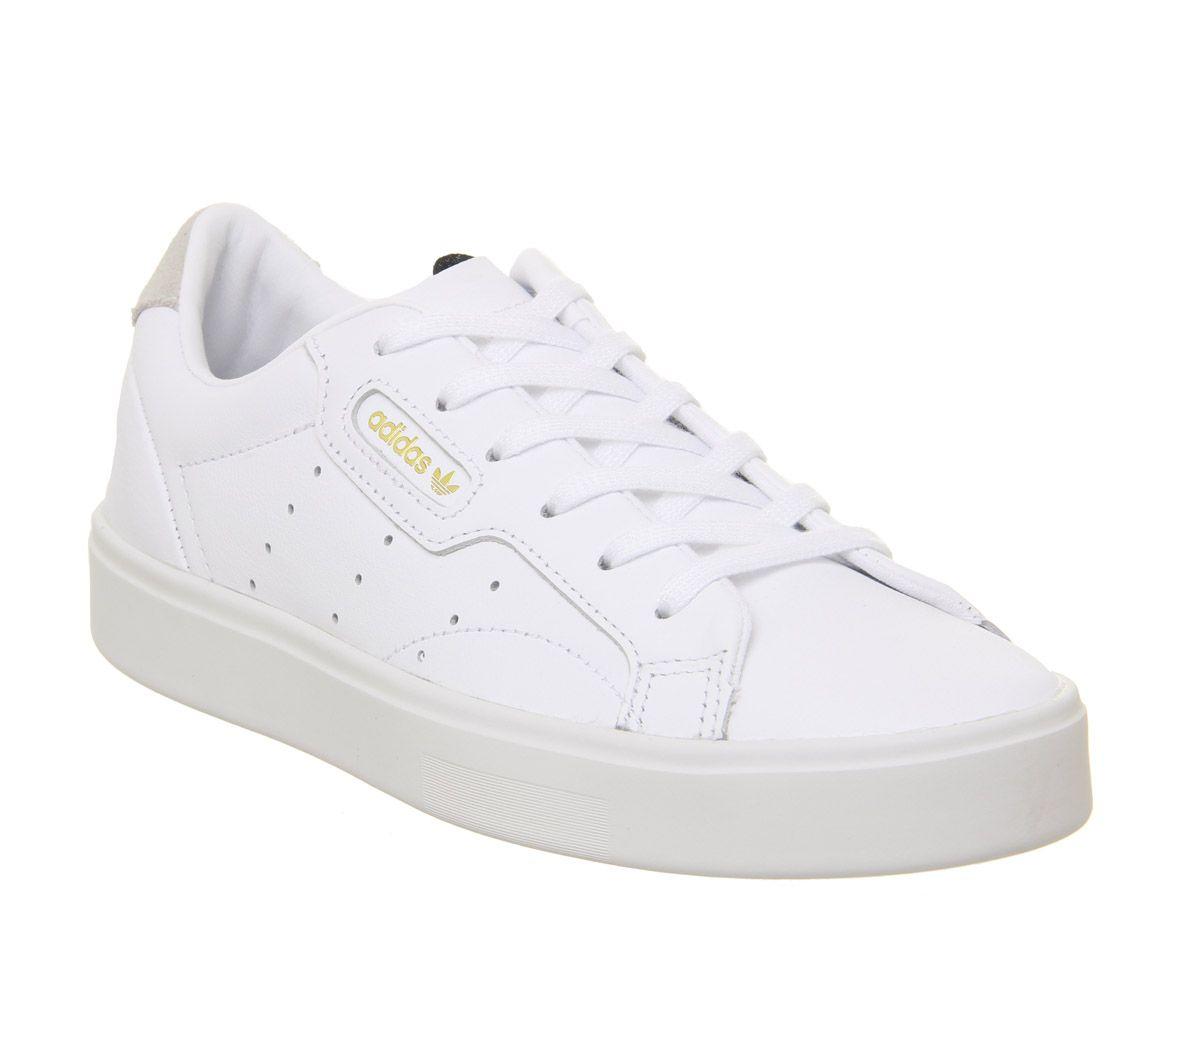 fb73c0547 adidas Sleek Trainers White White Crystal White - Hers trainers